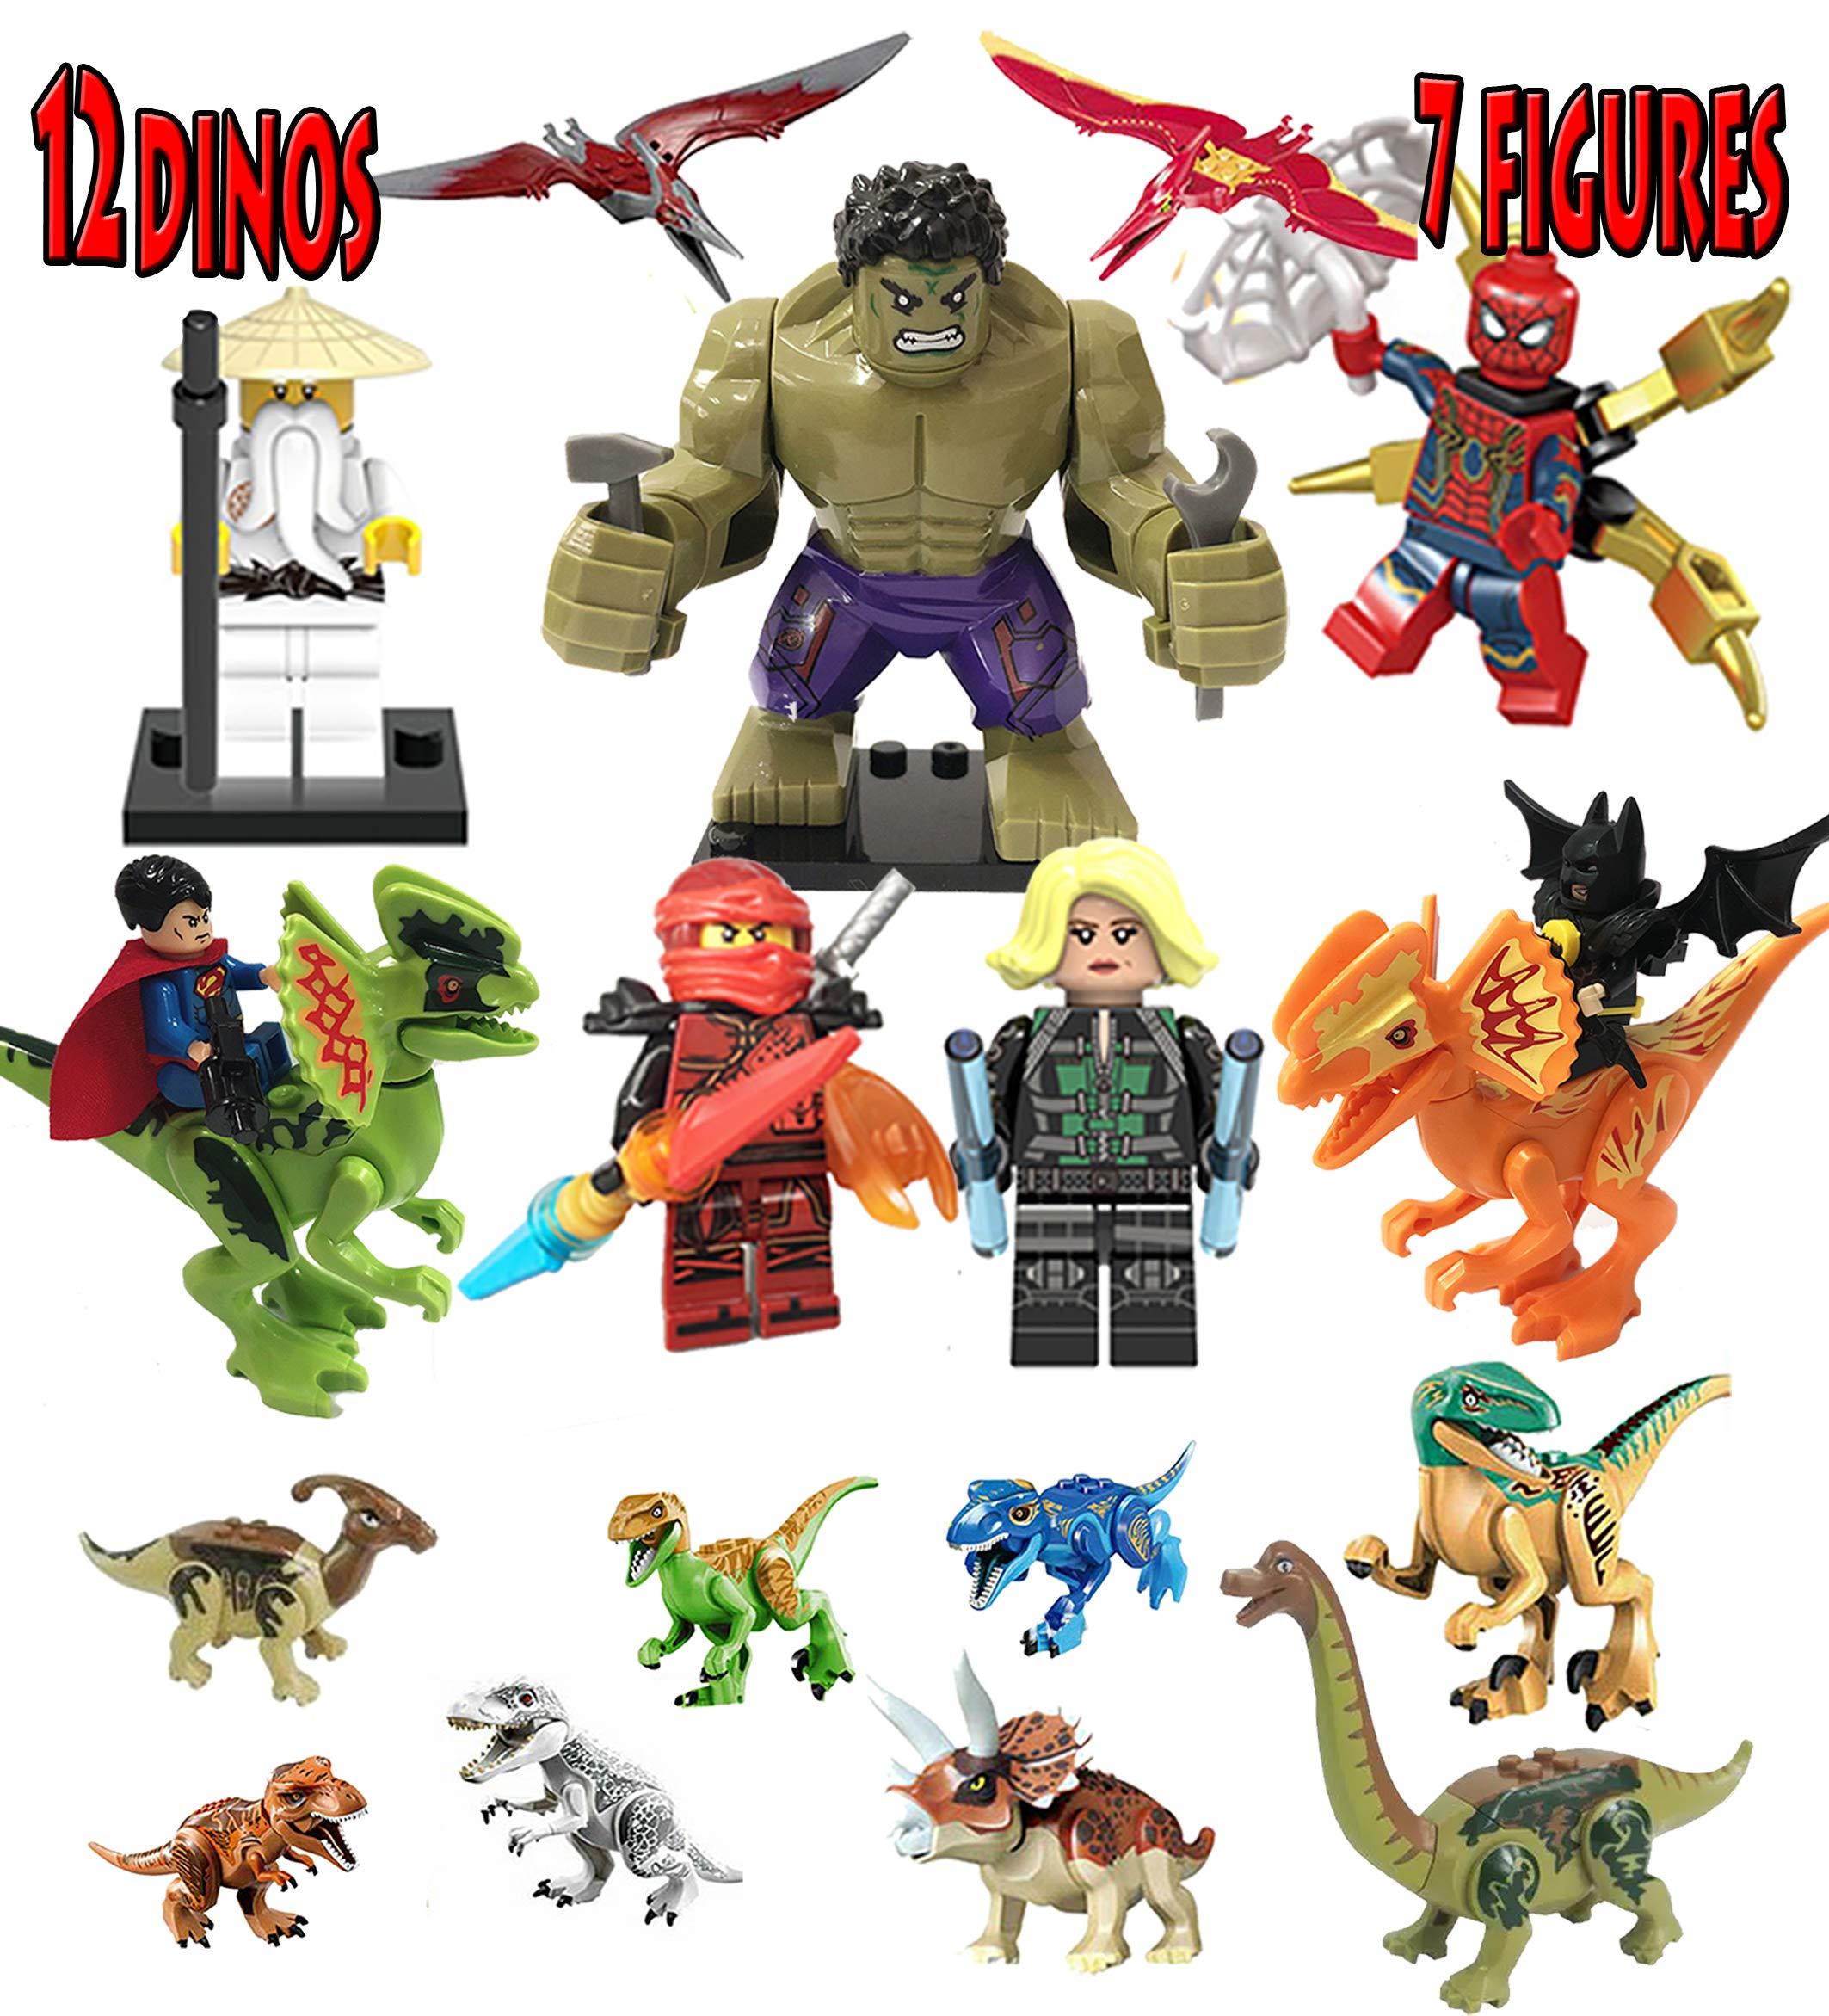 MyElegantMoments Marvel Minifigures Superheroes Spiderman Hulk Dinosaurs Building Blocks Marvel Figures Toys Superman, Batman, Captain Marvel toys Action Figures,Educational Gift for Boys&Girls(19pcs)